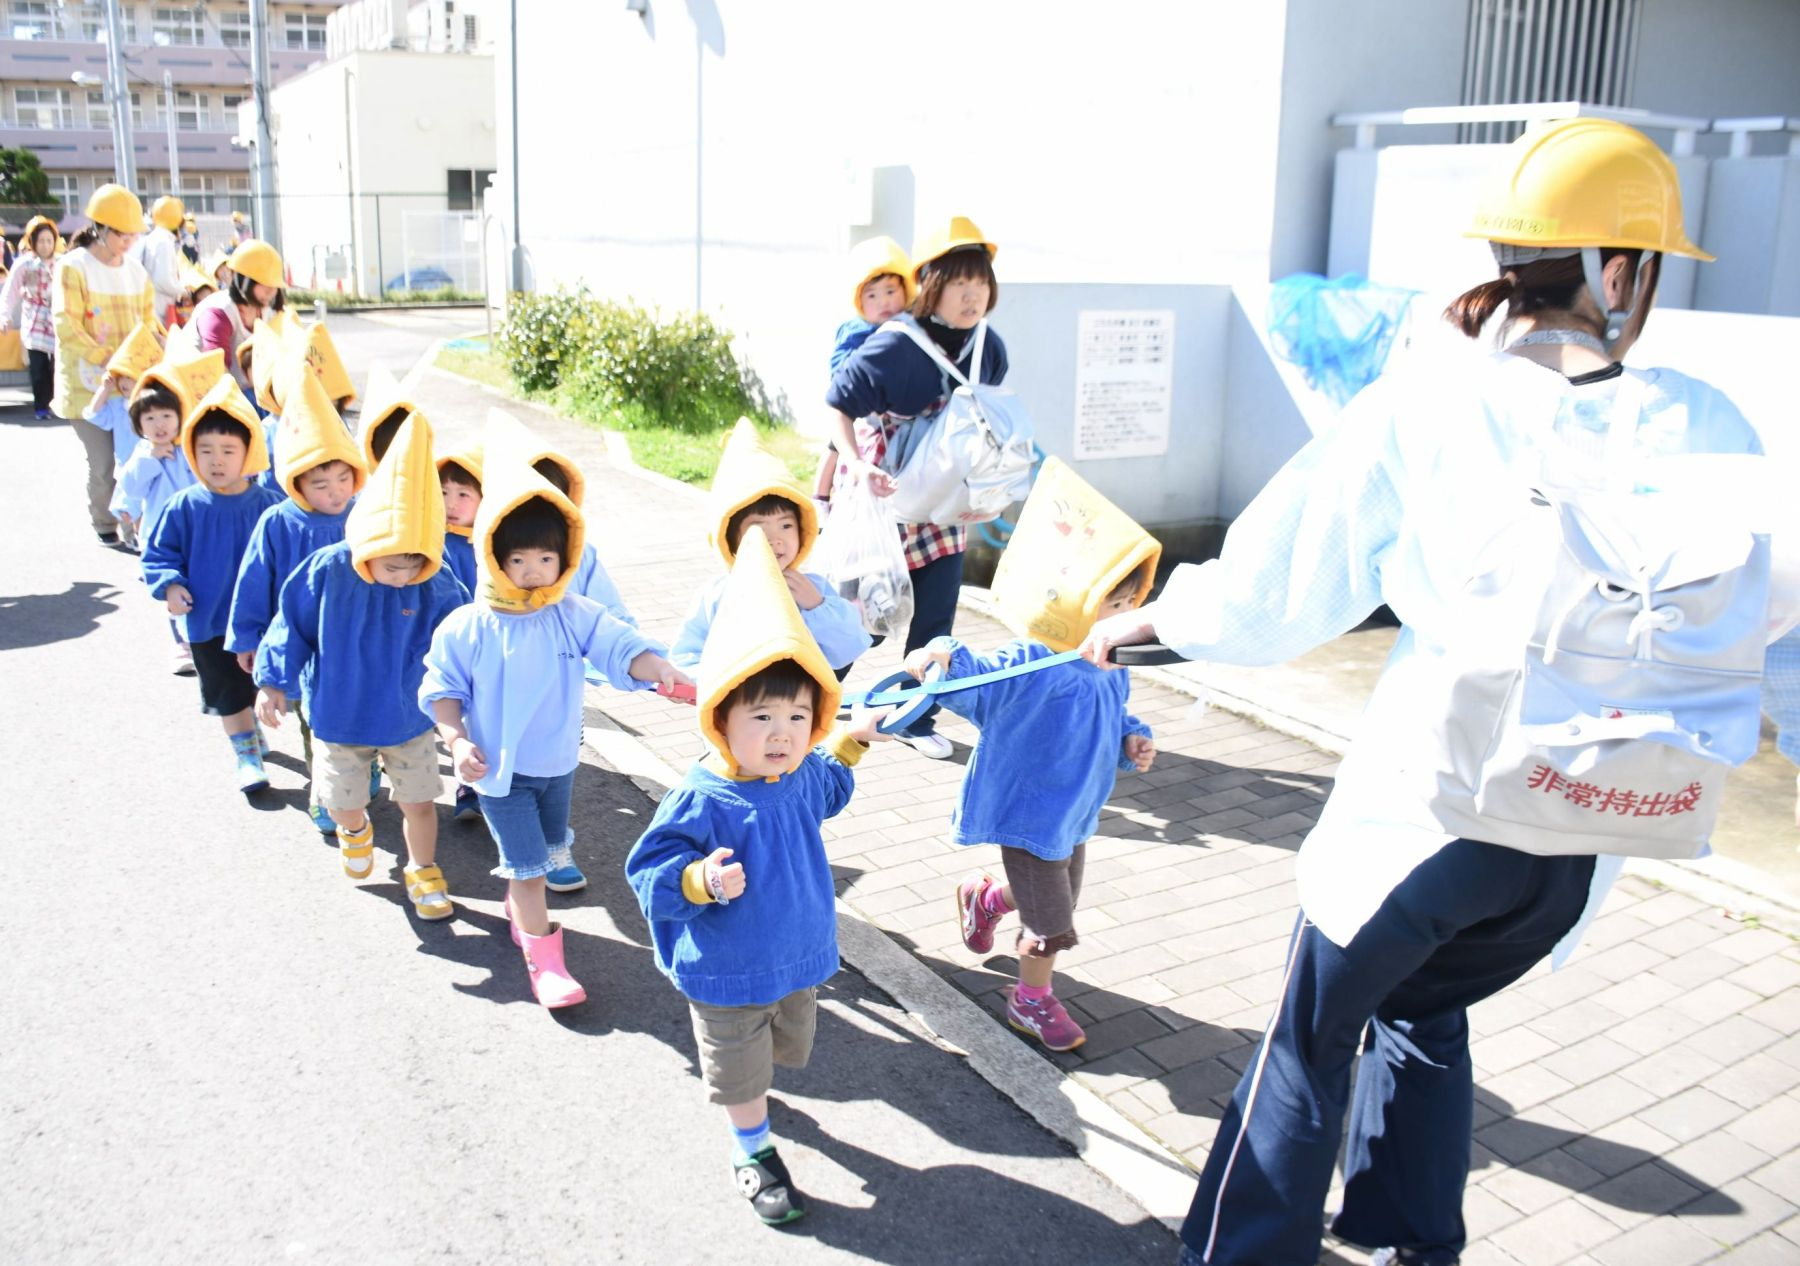 Japan Nursery School AI Robots 015